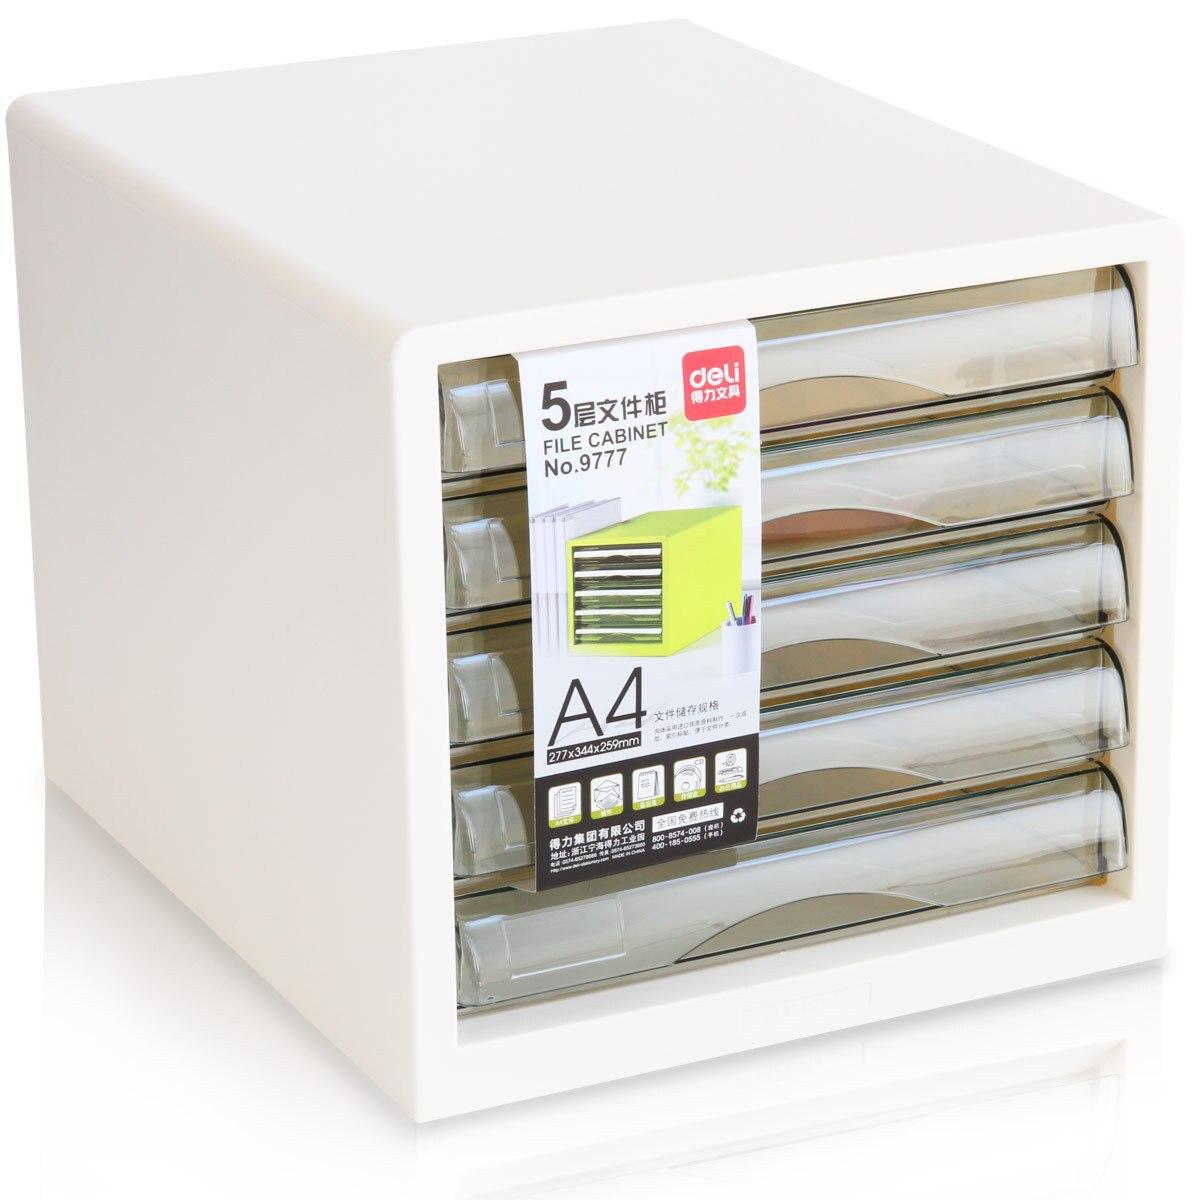 Фото - Five-storey FileFive-storey Desktop File Cabinet Drawer Plastic File Cabinet Receiving Cabinet hubert footner madame storey